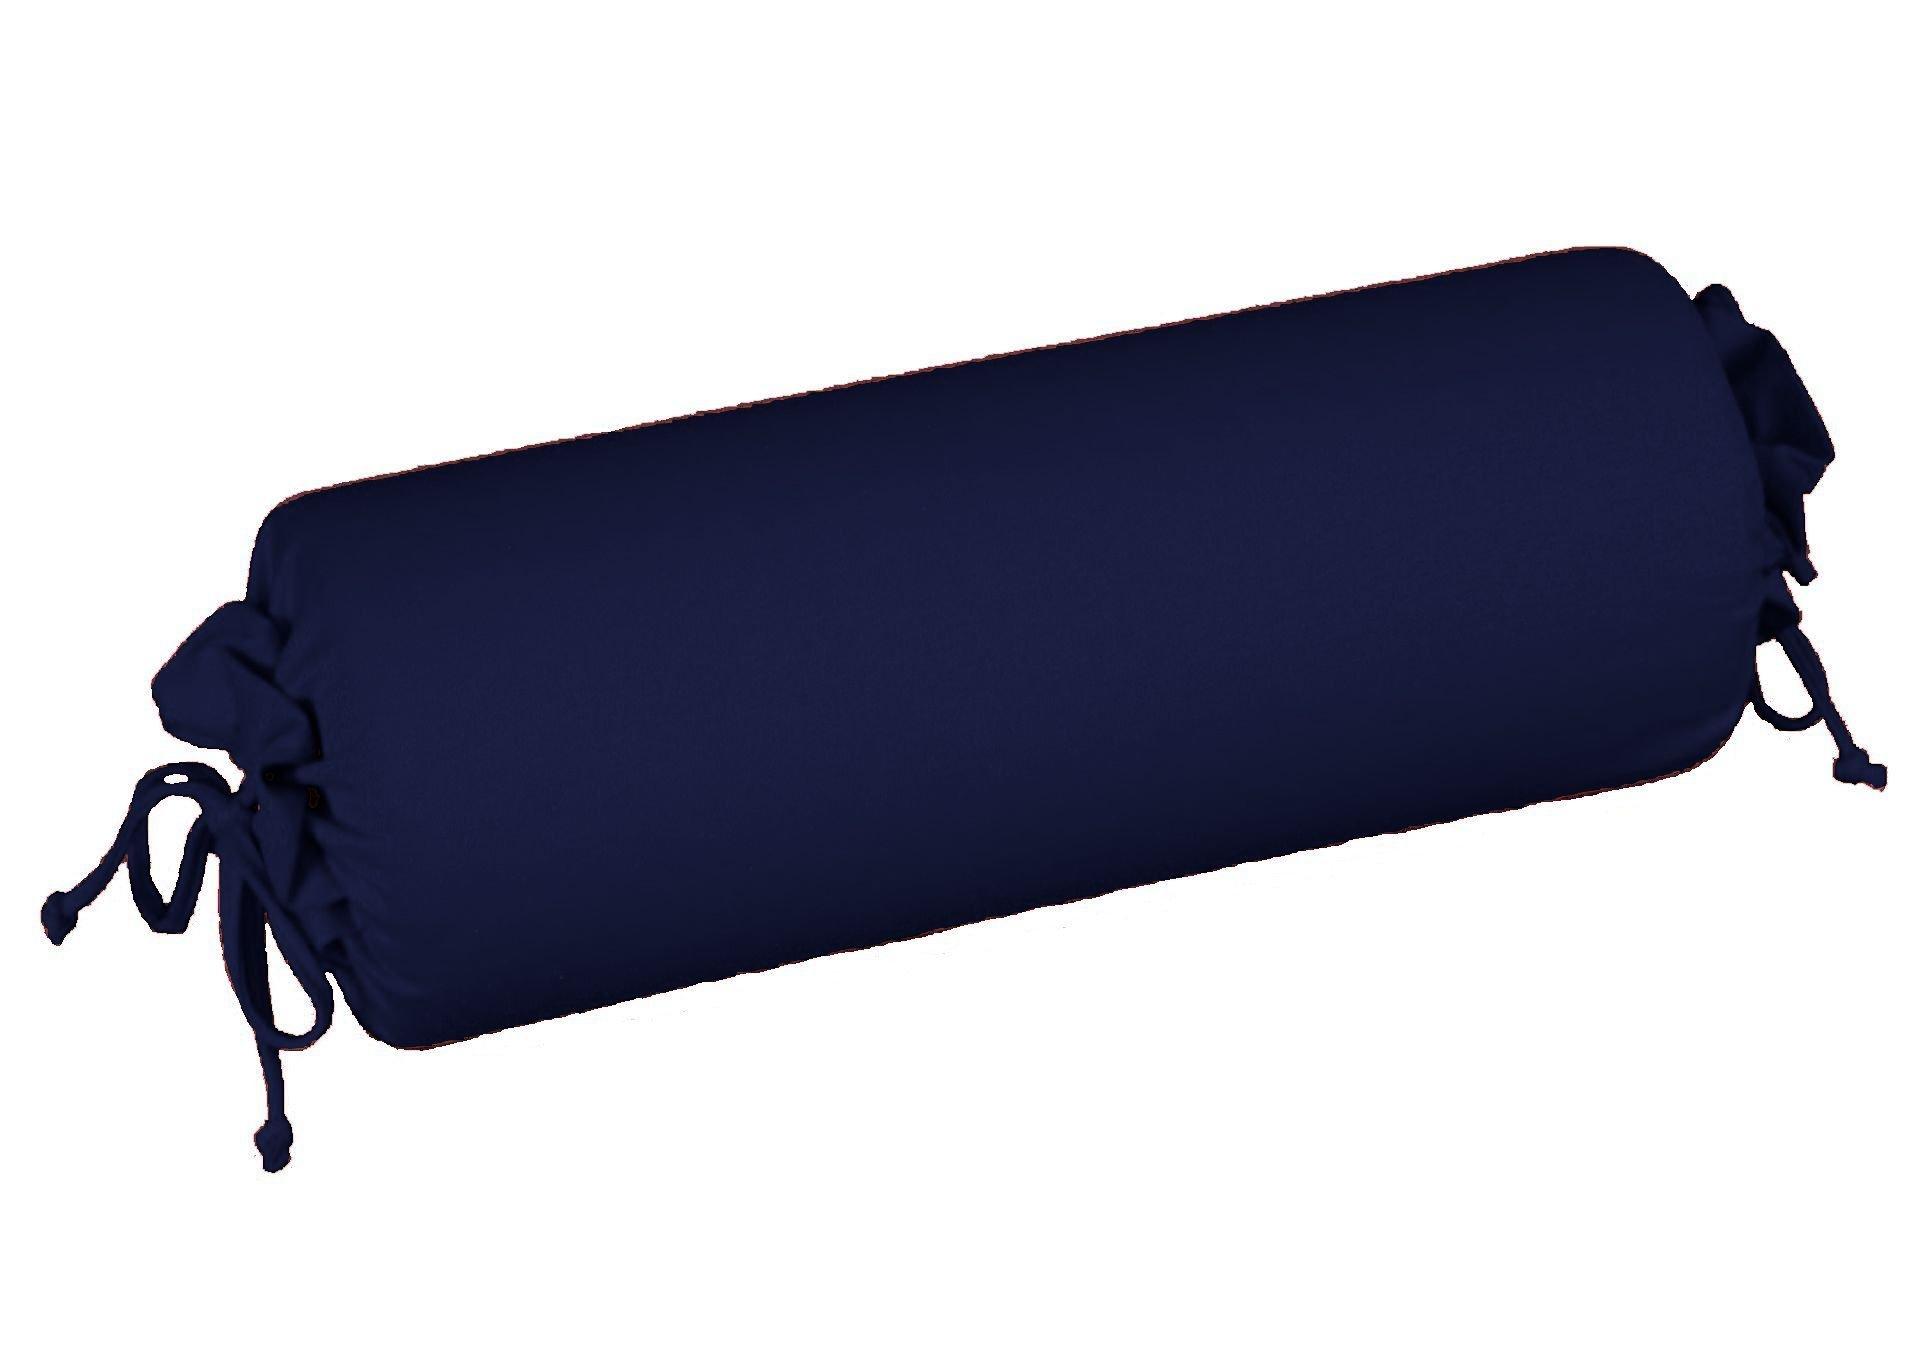 Edel-Zwirn-Jersey marine B15cm